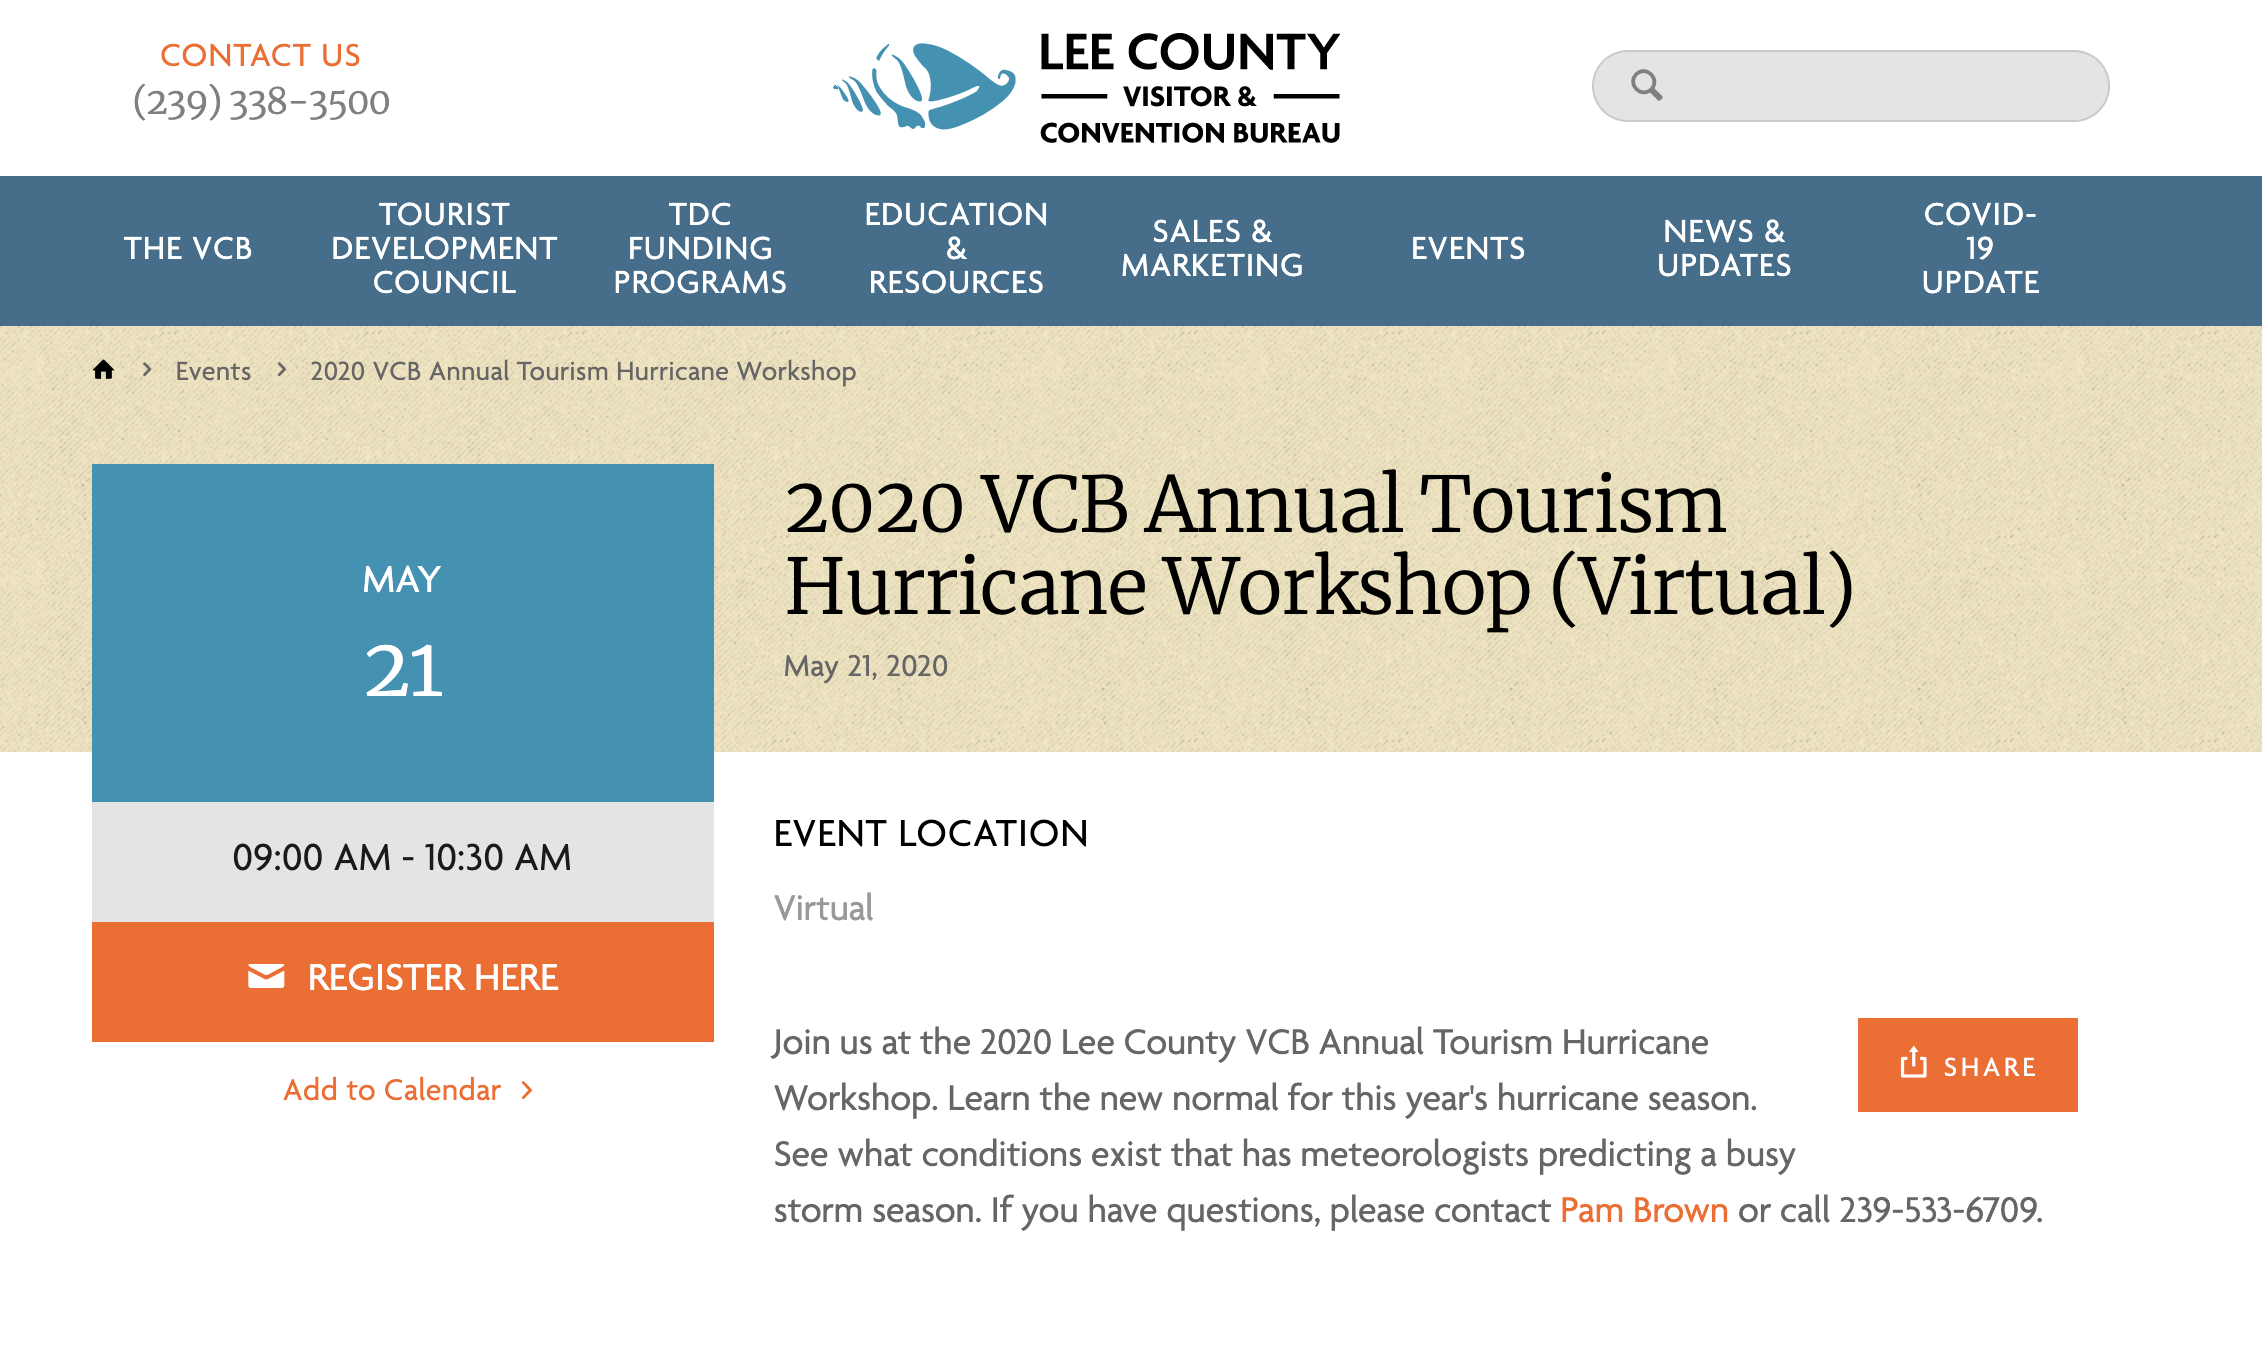 VCB Annual Tourism Hurricane Workshop - May 21